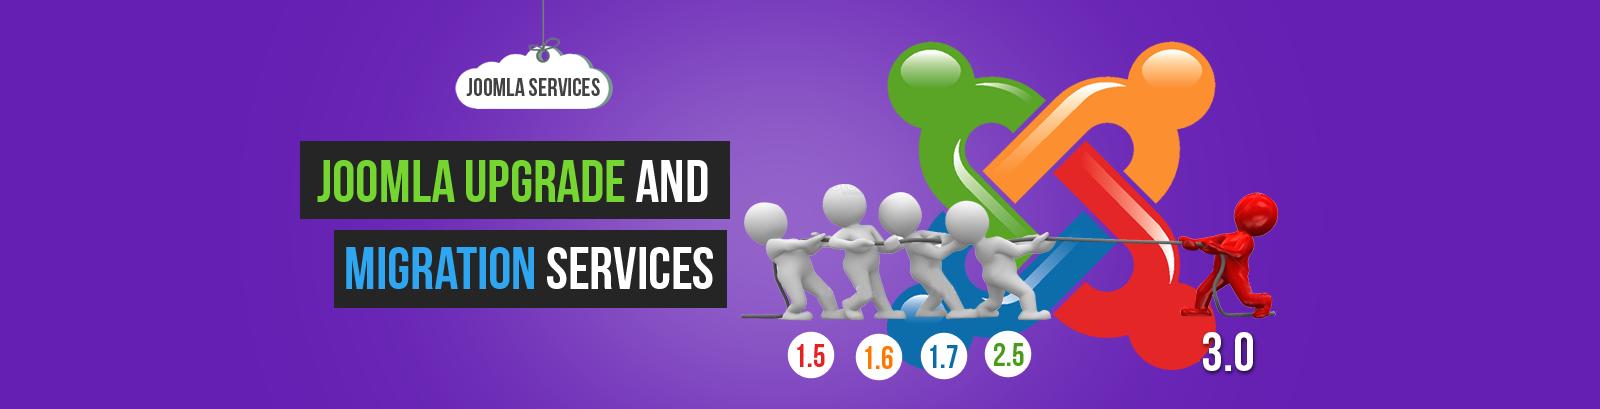 SEO and Joomla Services